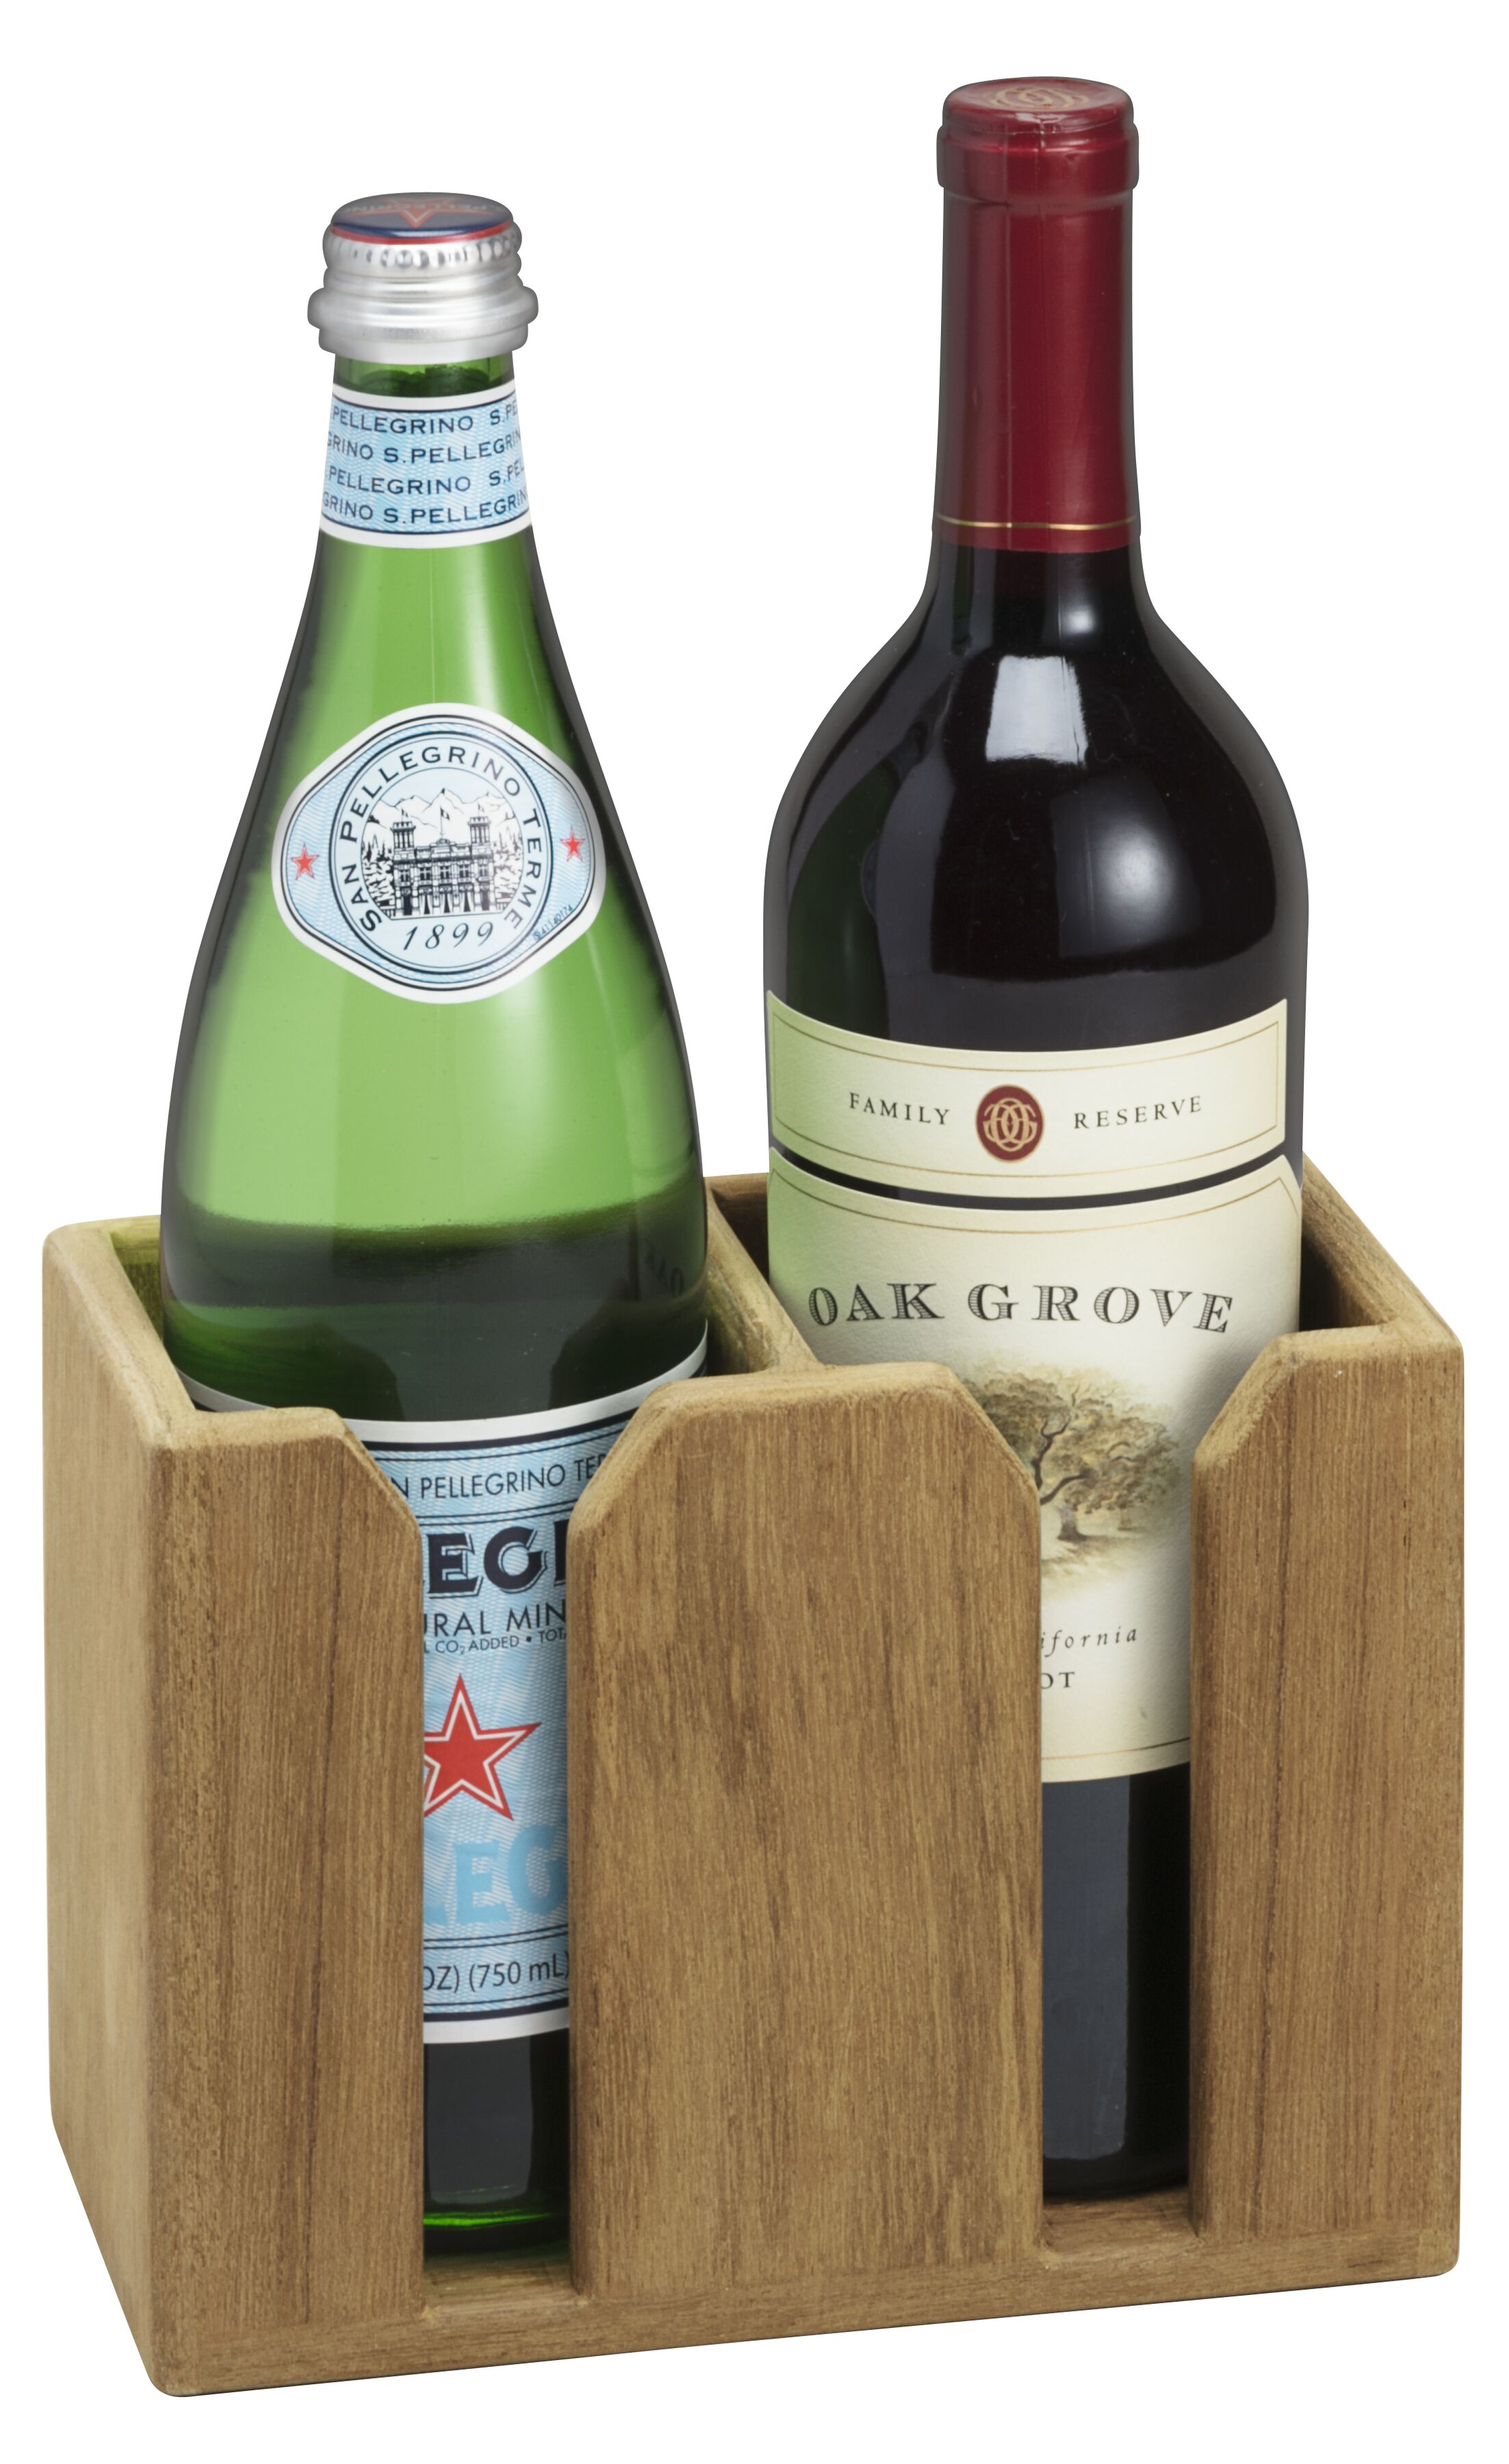 2 Bottle Tabletop Wine Holder